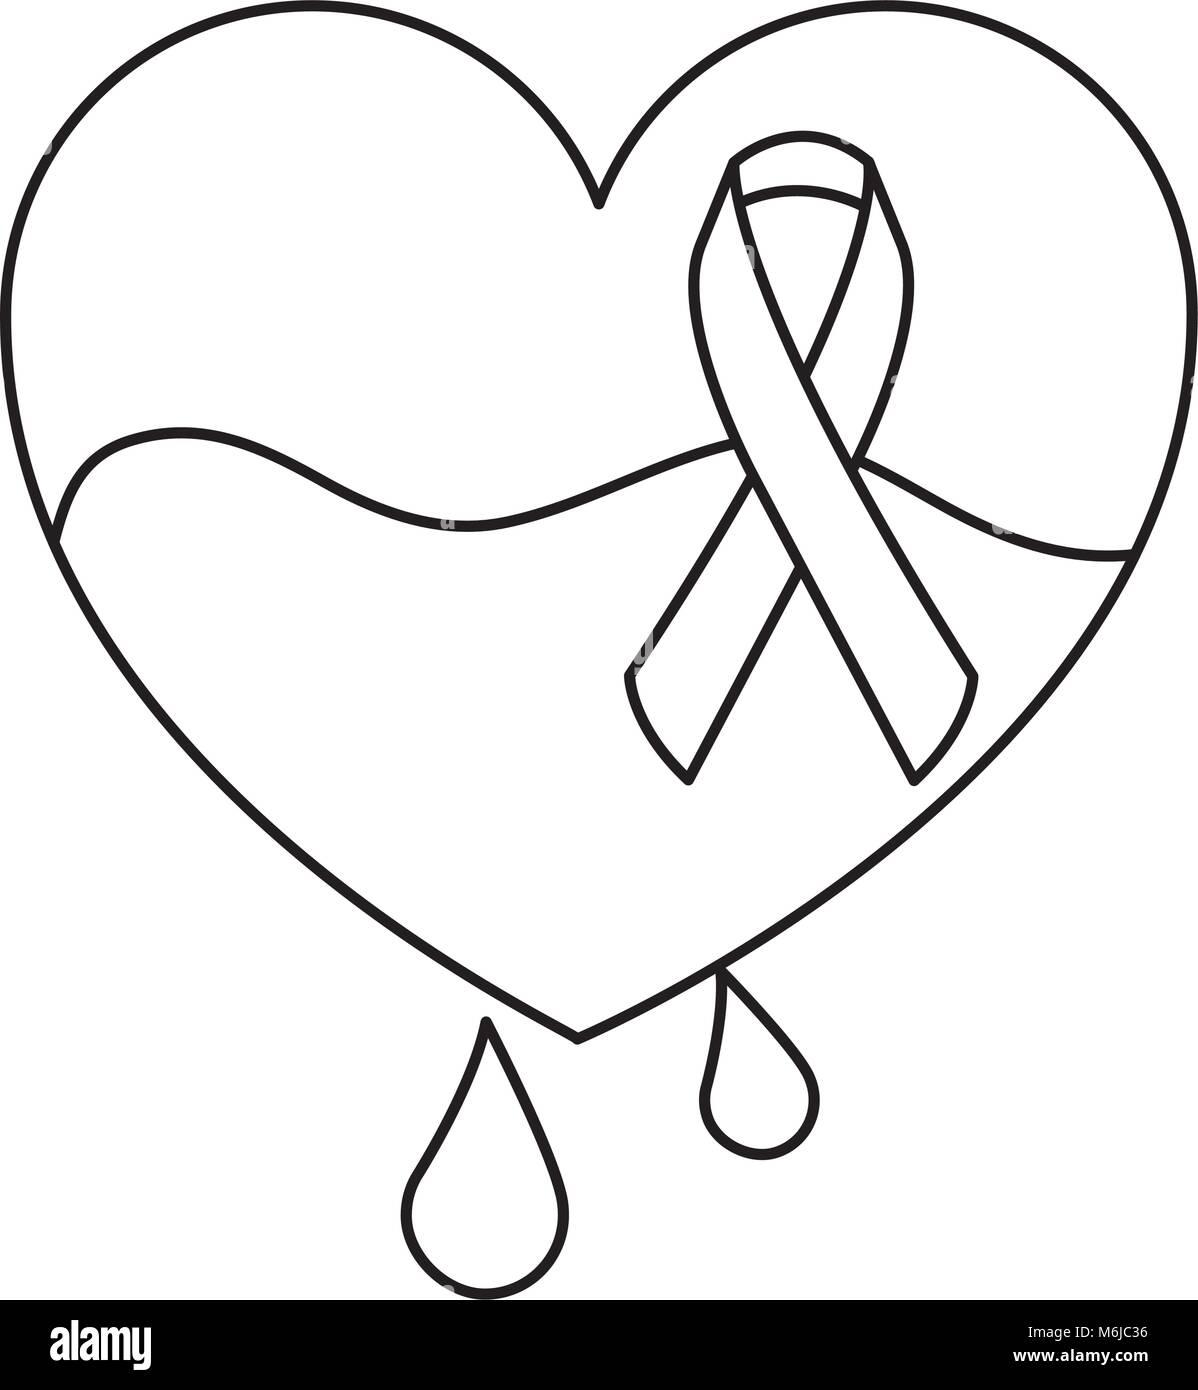 hemophilia heart blood and ribbon card - Stock Image